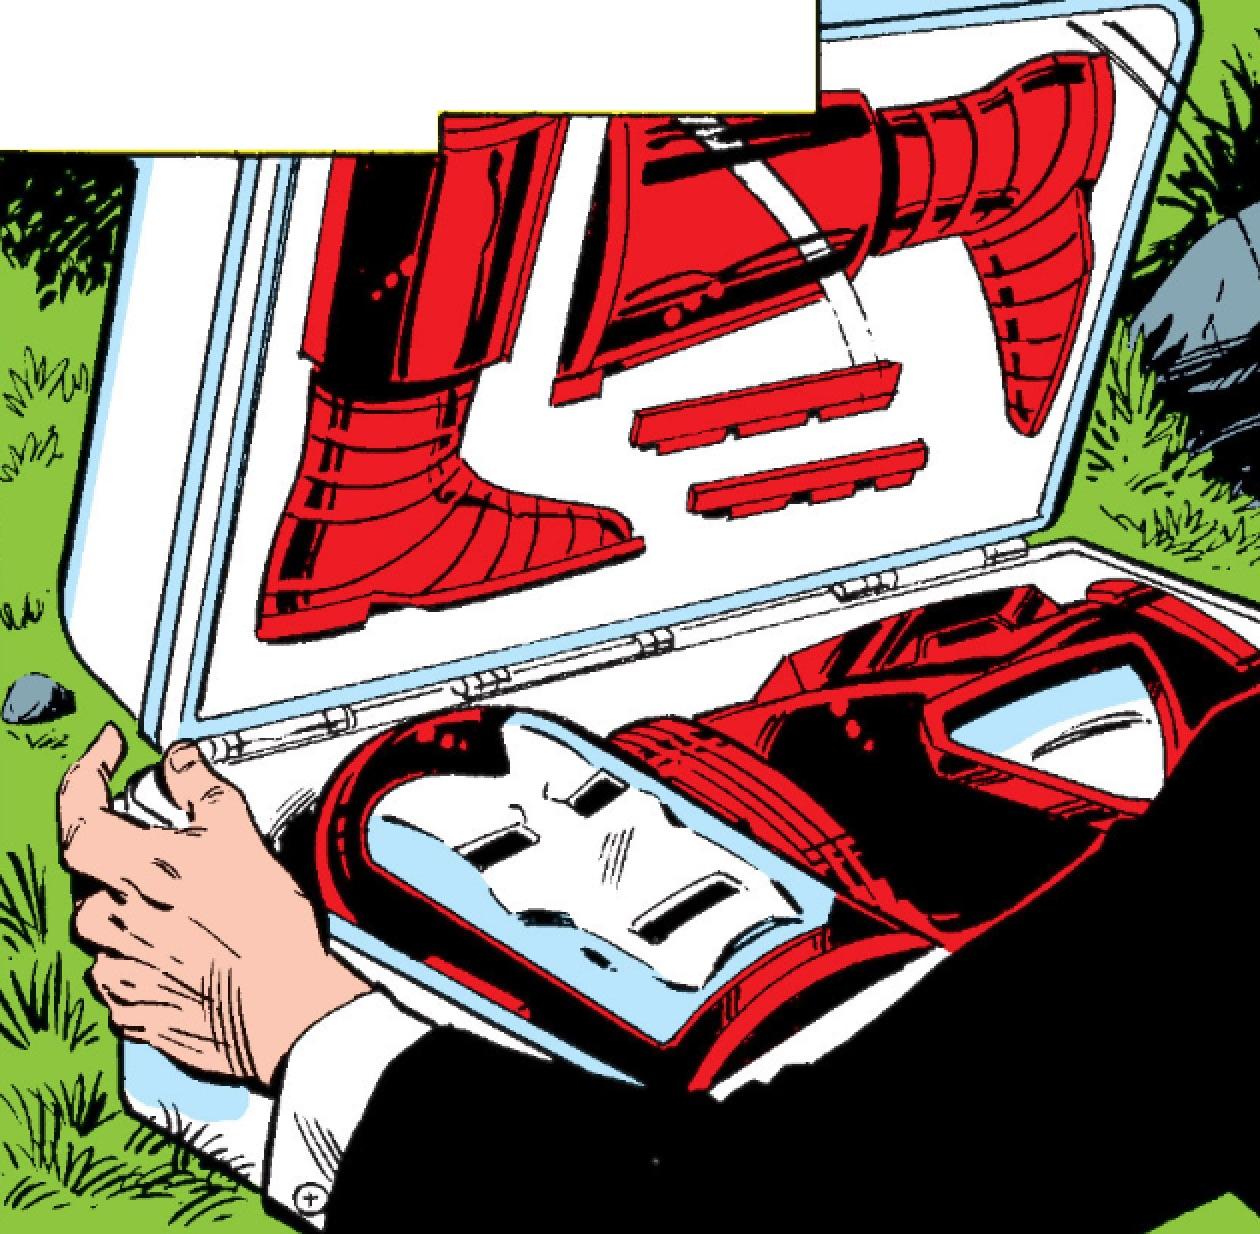 Iron Man's Briefcase